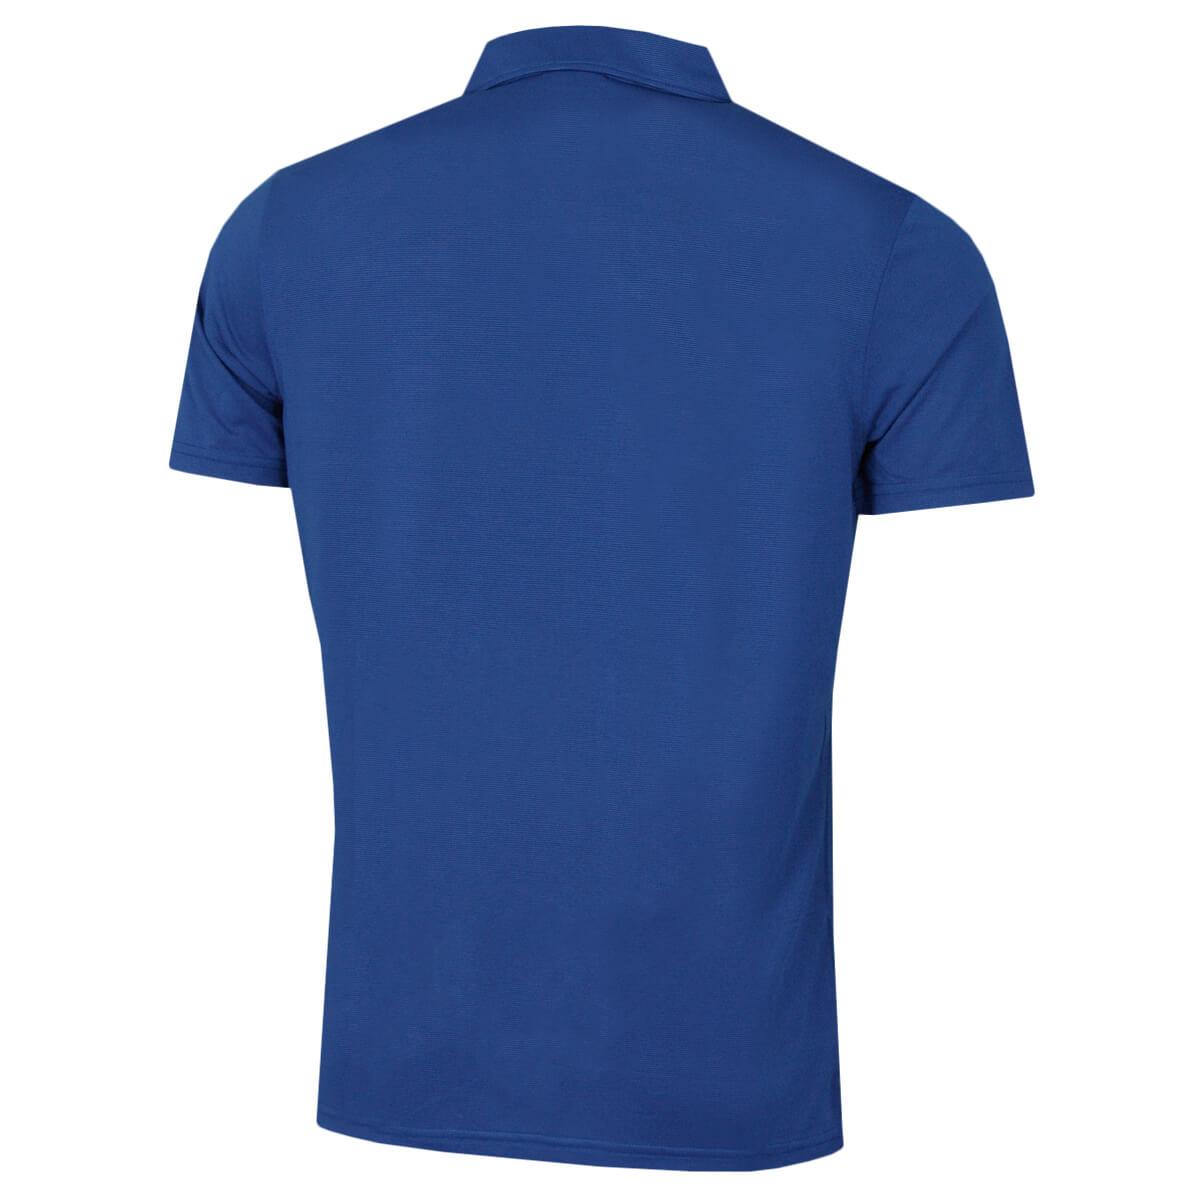 thumbnail 12 - Calvin Klein Mens 2021 Central Eco Light Wicking Golf Polo Shirt 28% OFF RRP